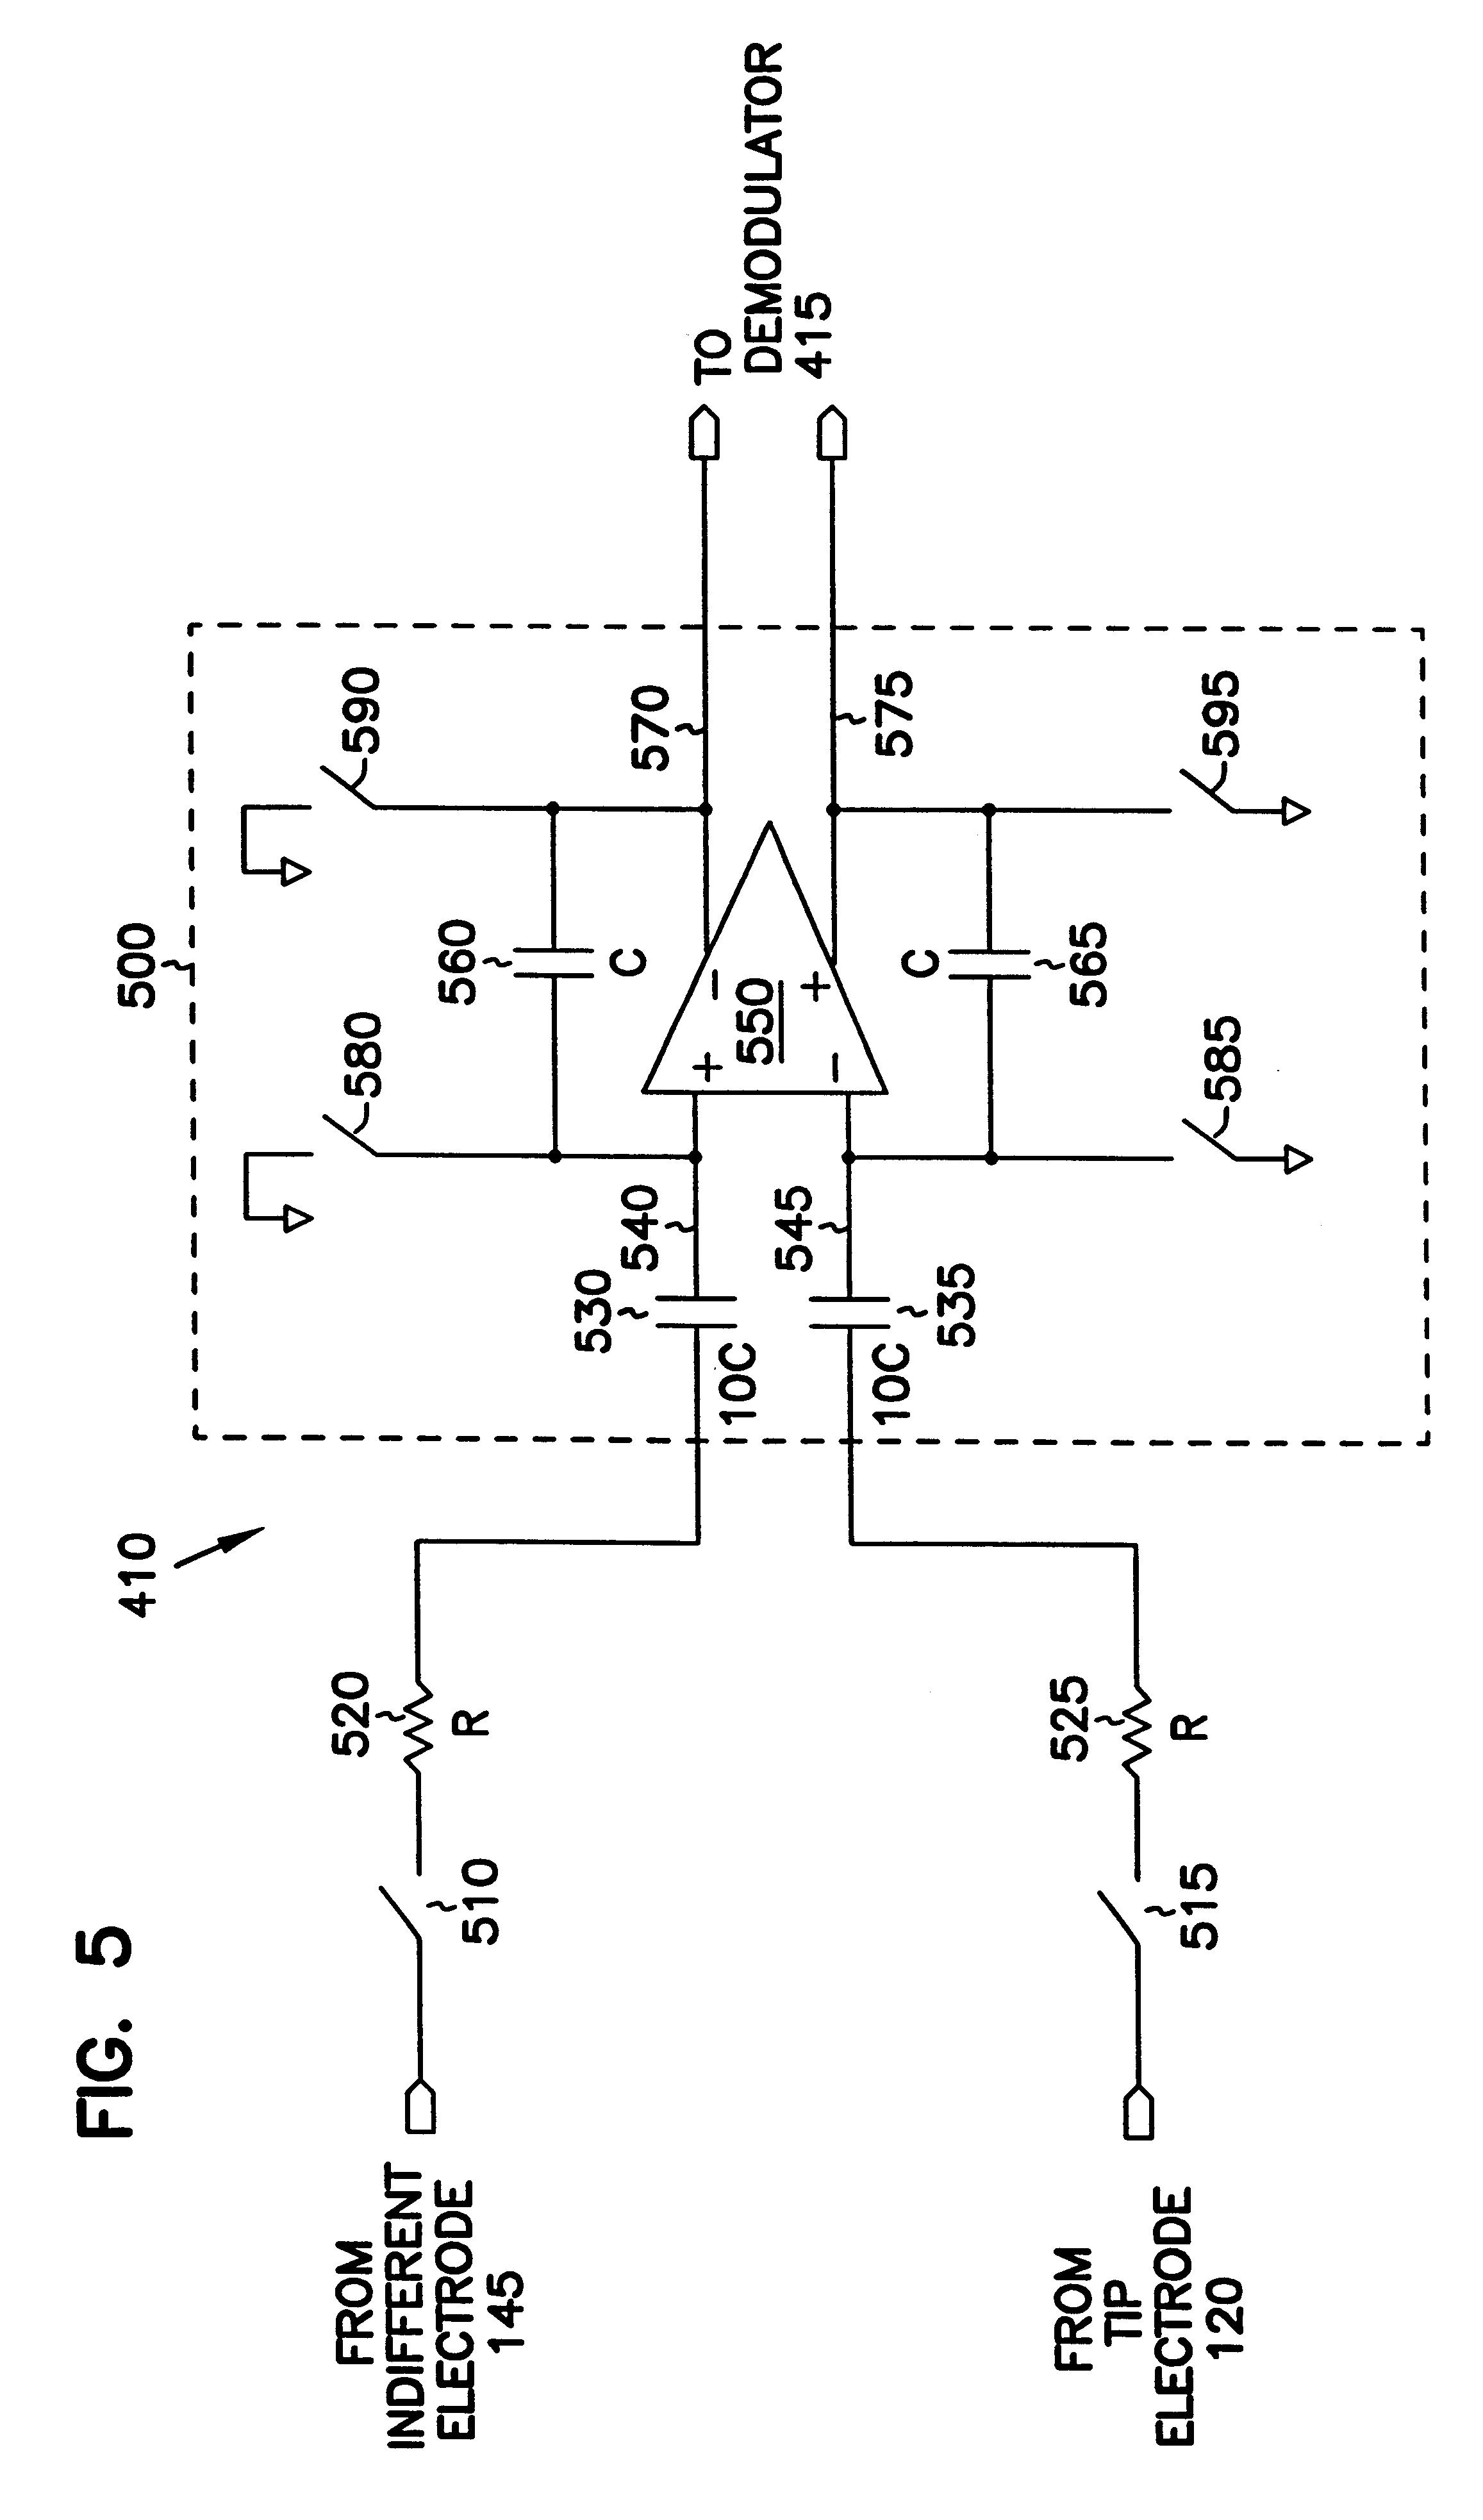 patente us6463326